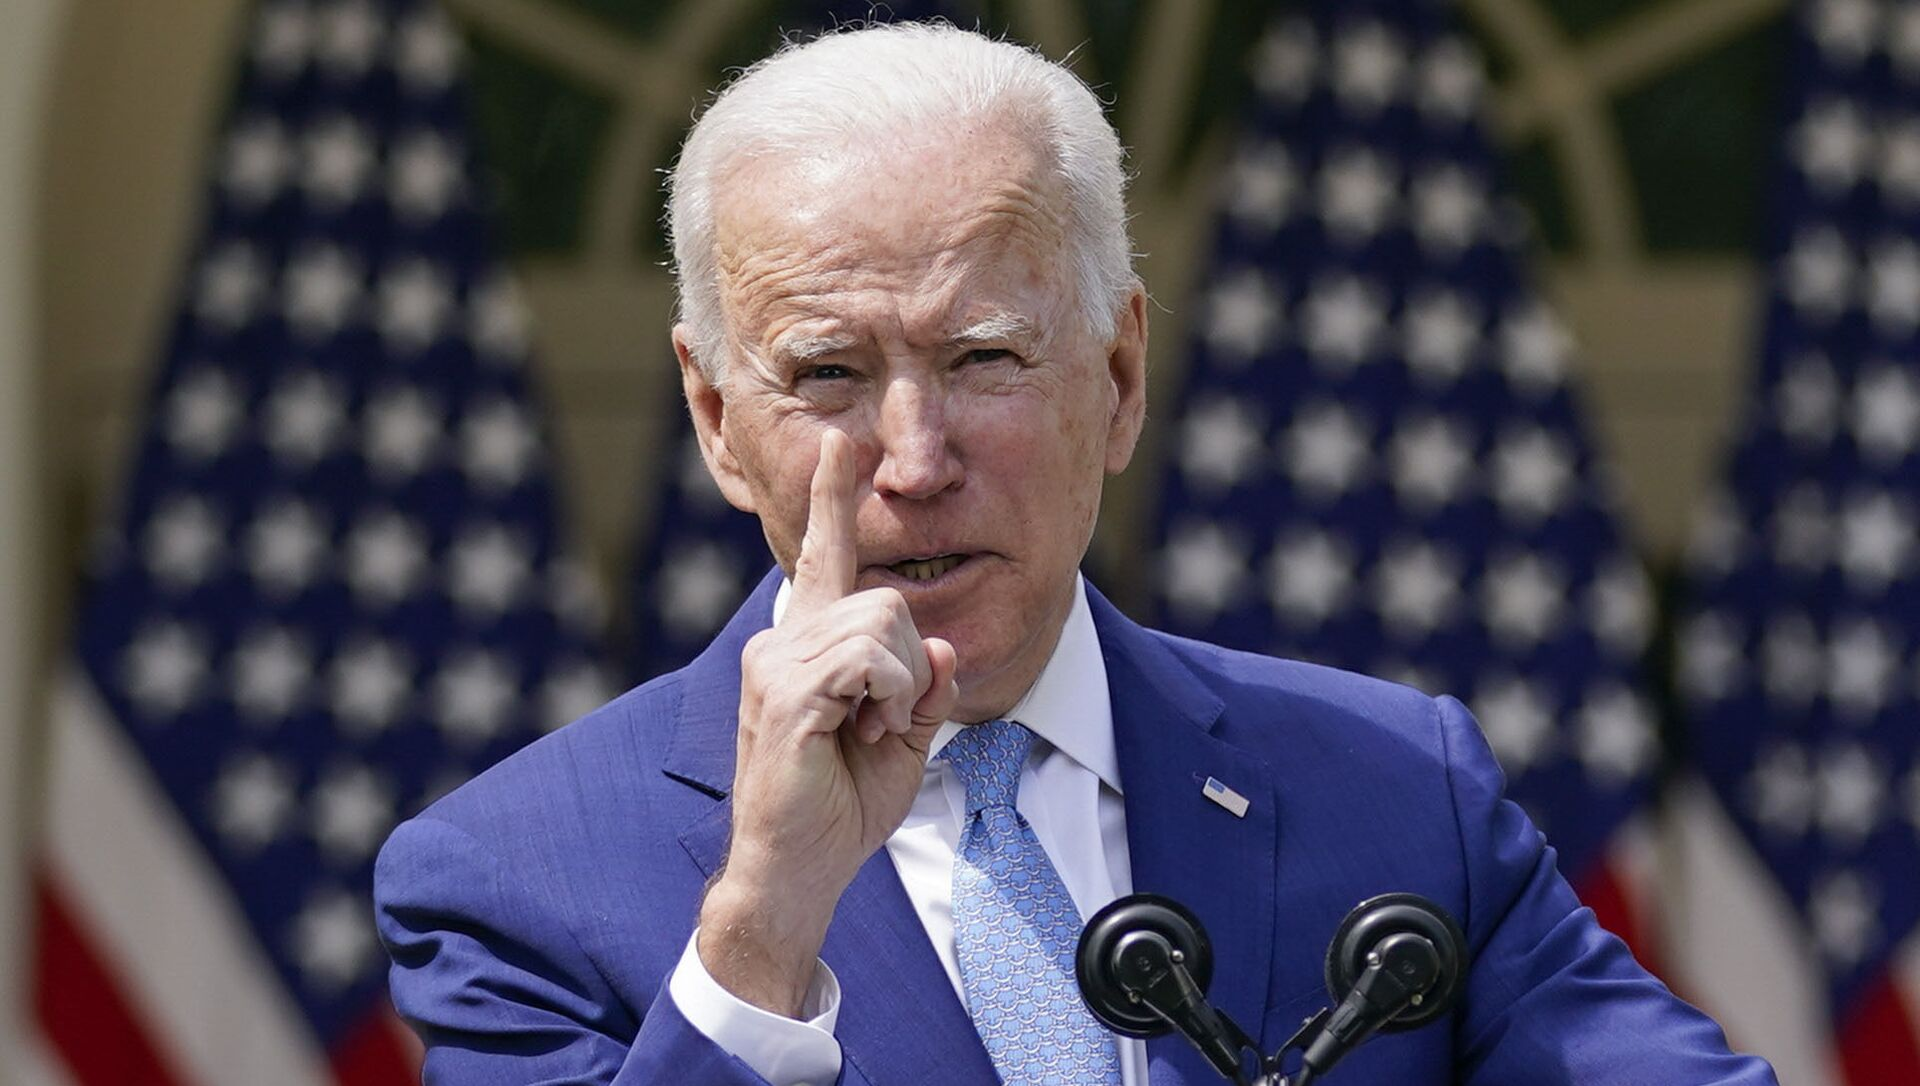 President Joe Biden gestures as he speaks about gun violence prevention in the Rose Garden at the White House, Thursday, April 8, 2021, in Washington.  - Sputnik International, 1920, 08.04.2021